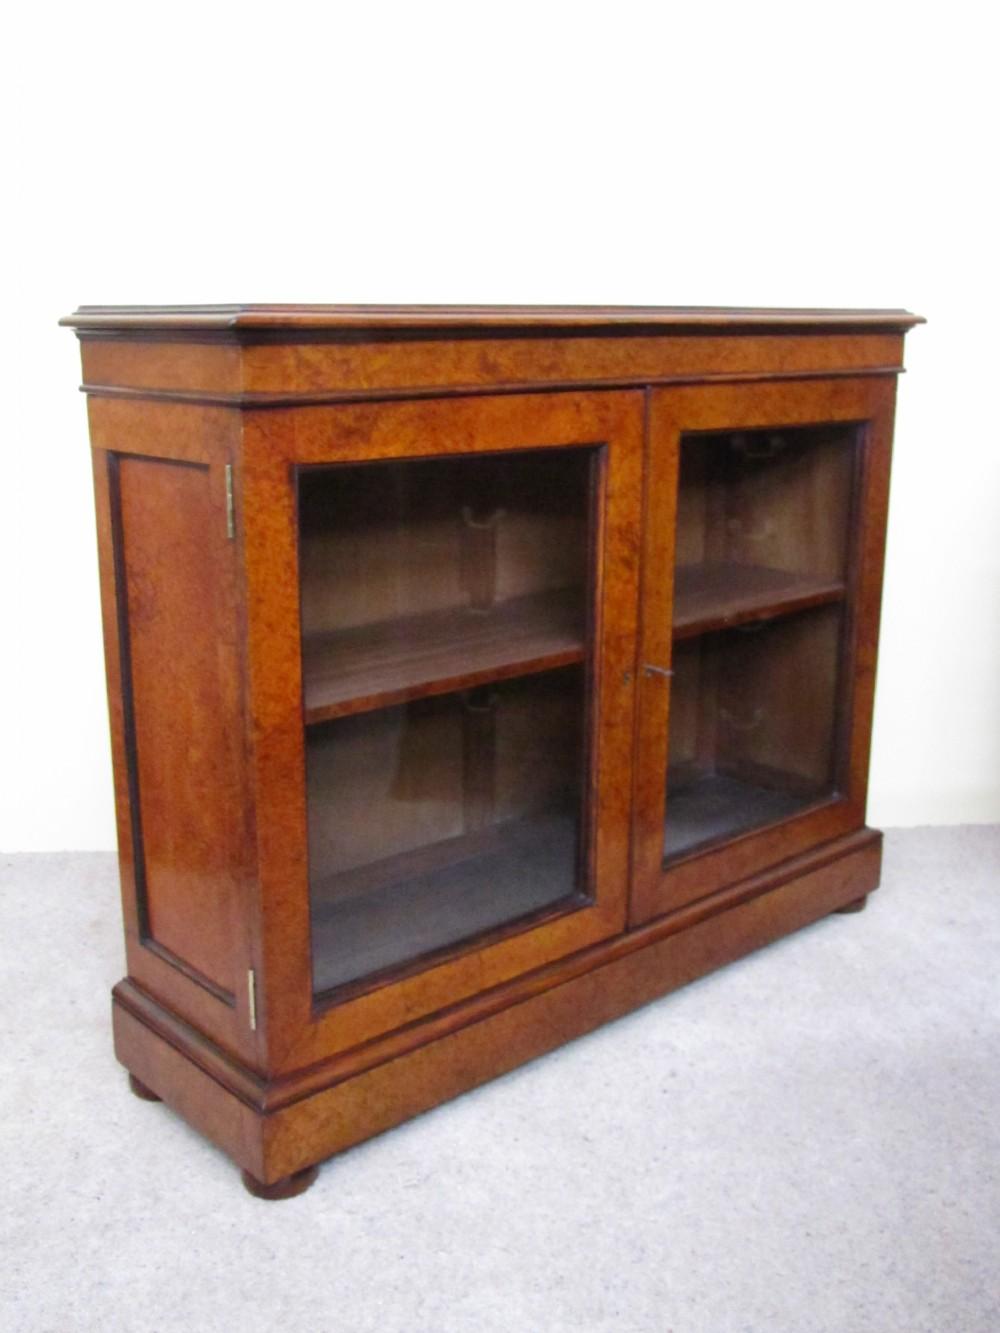 mid19th century amboyna rosewood glazed bookcase